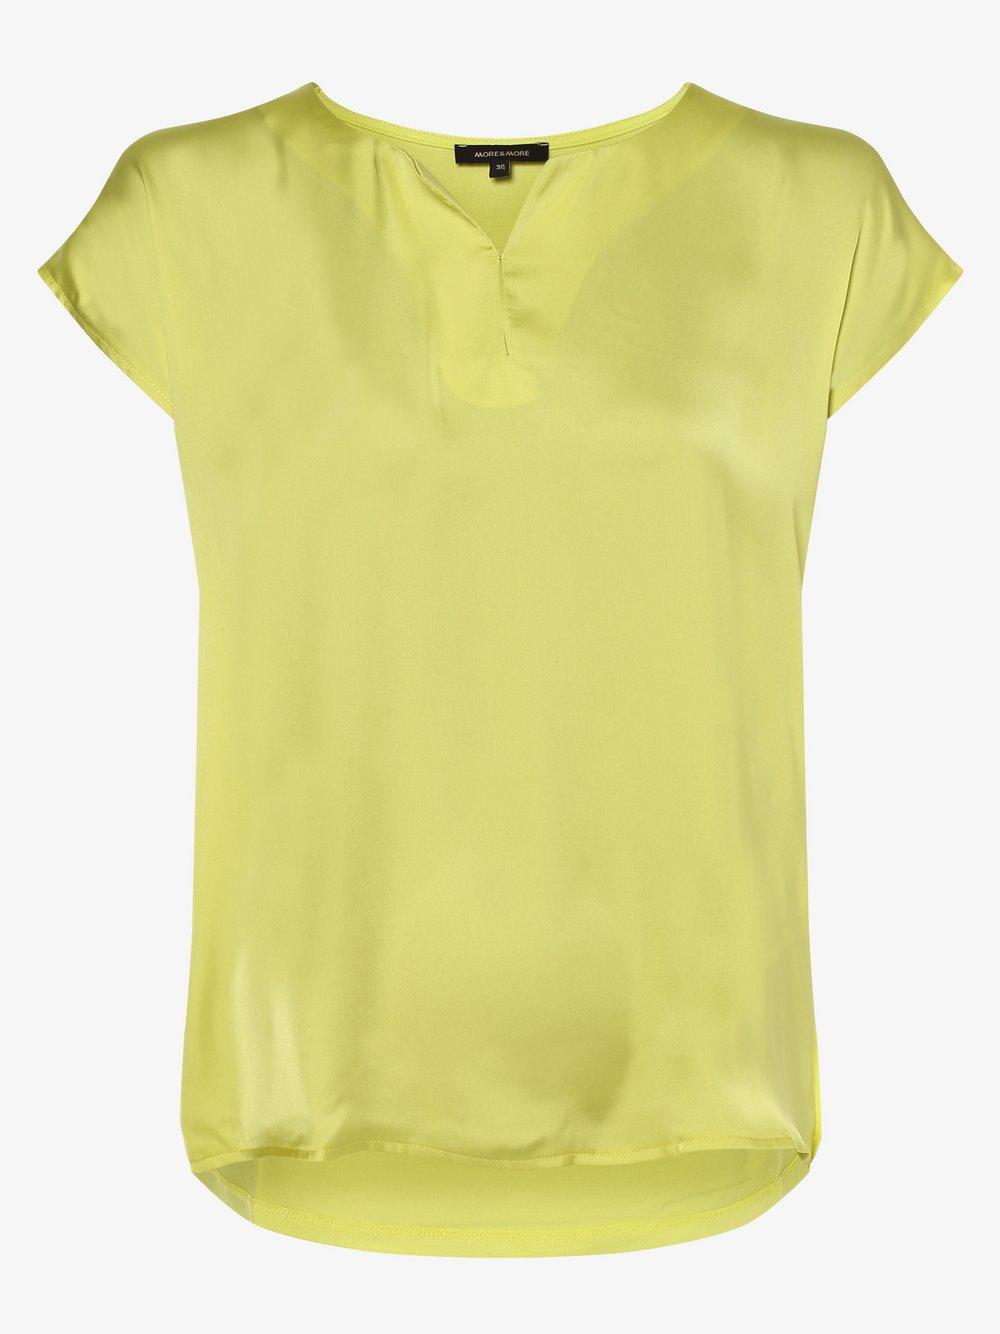 More & More - Koszulka damska, żółty